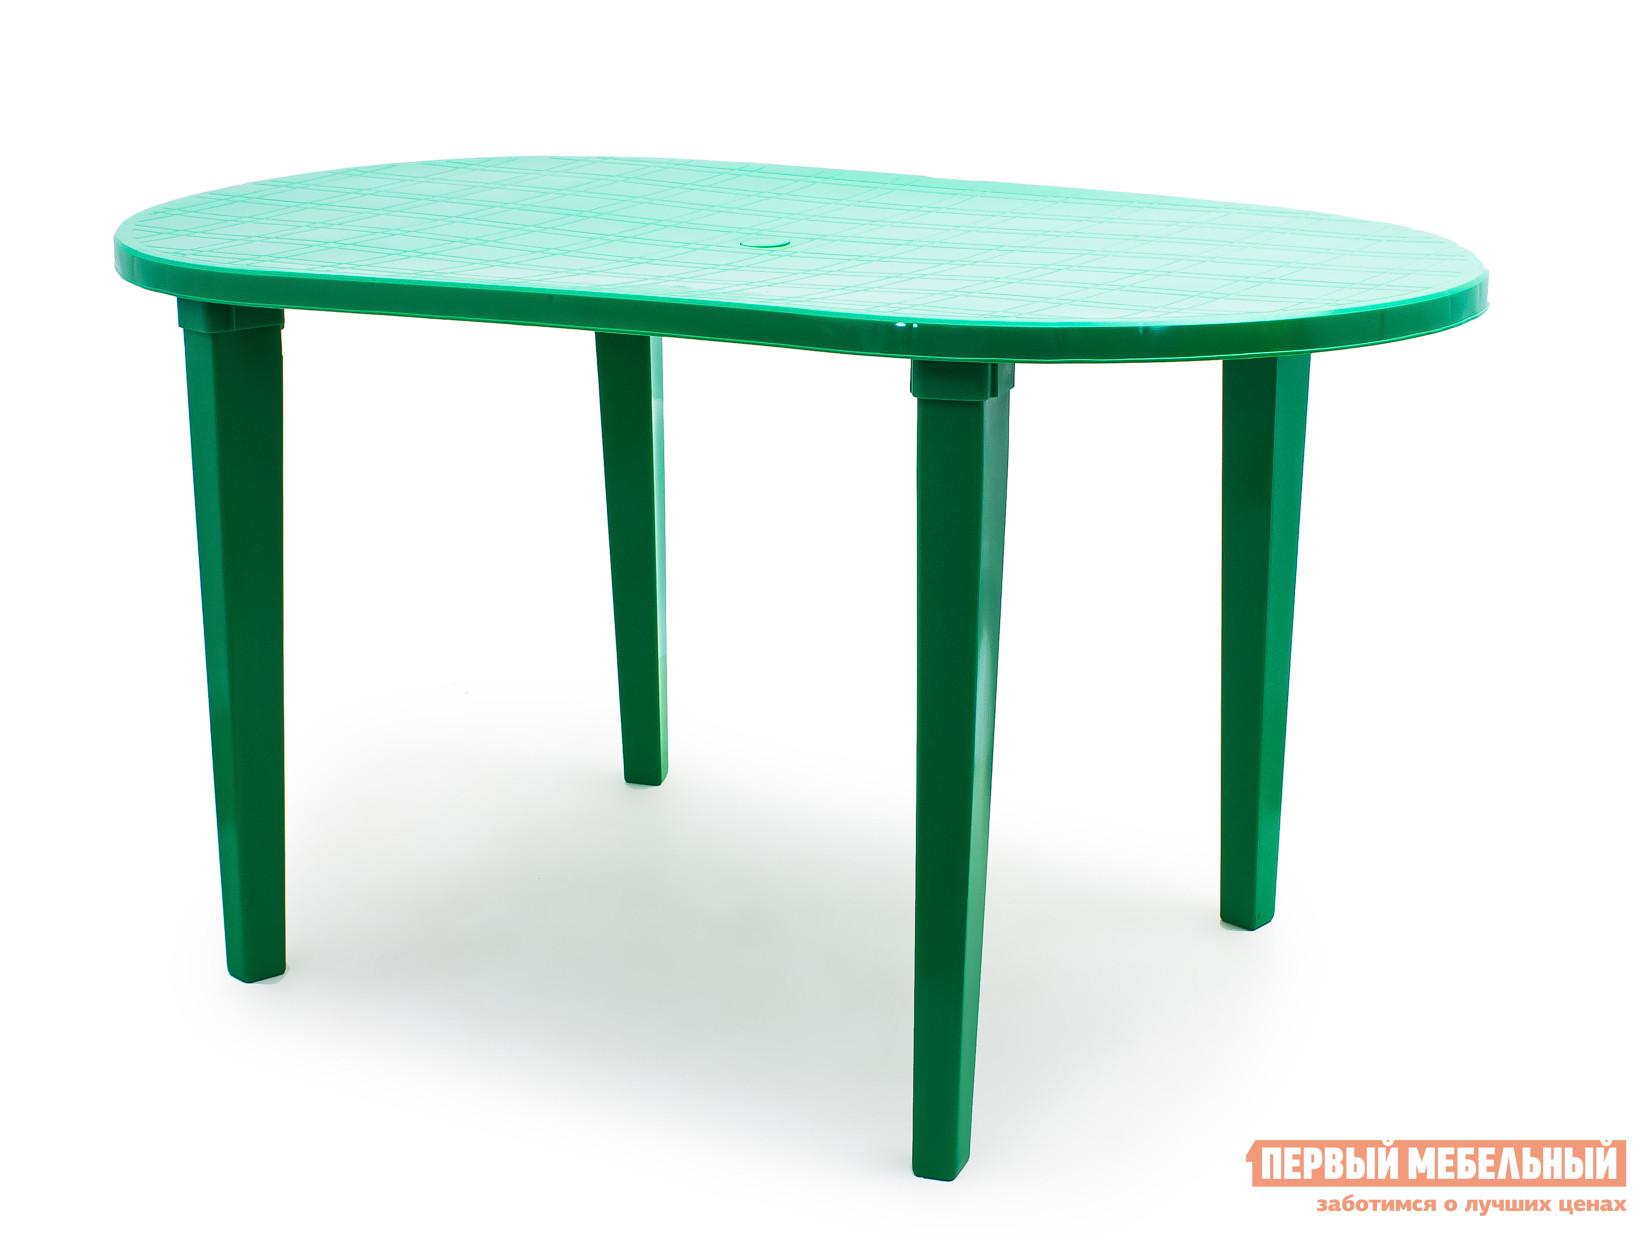 Пластиковый стол Стандарт Пластик Стол овальный (1400х800х710) мм Зеленый